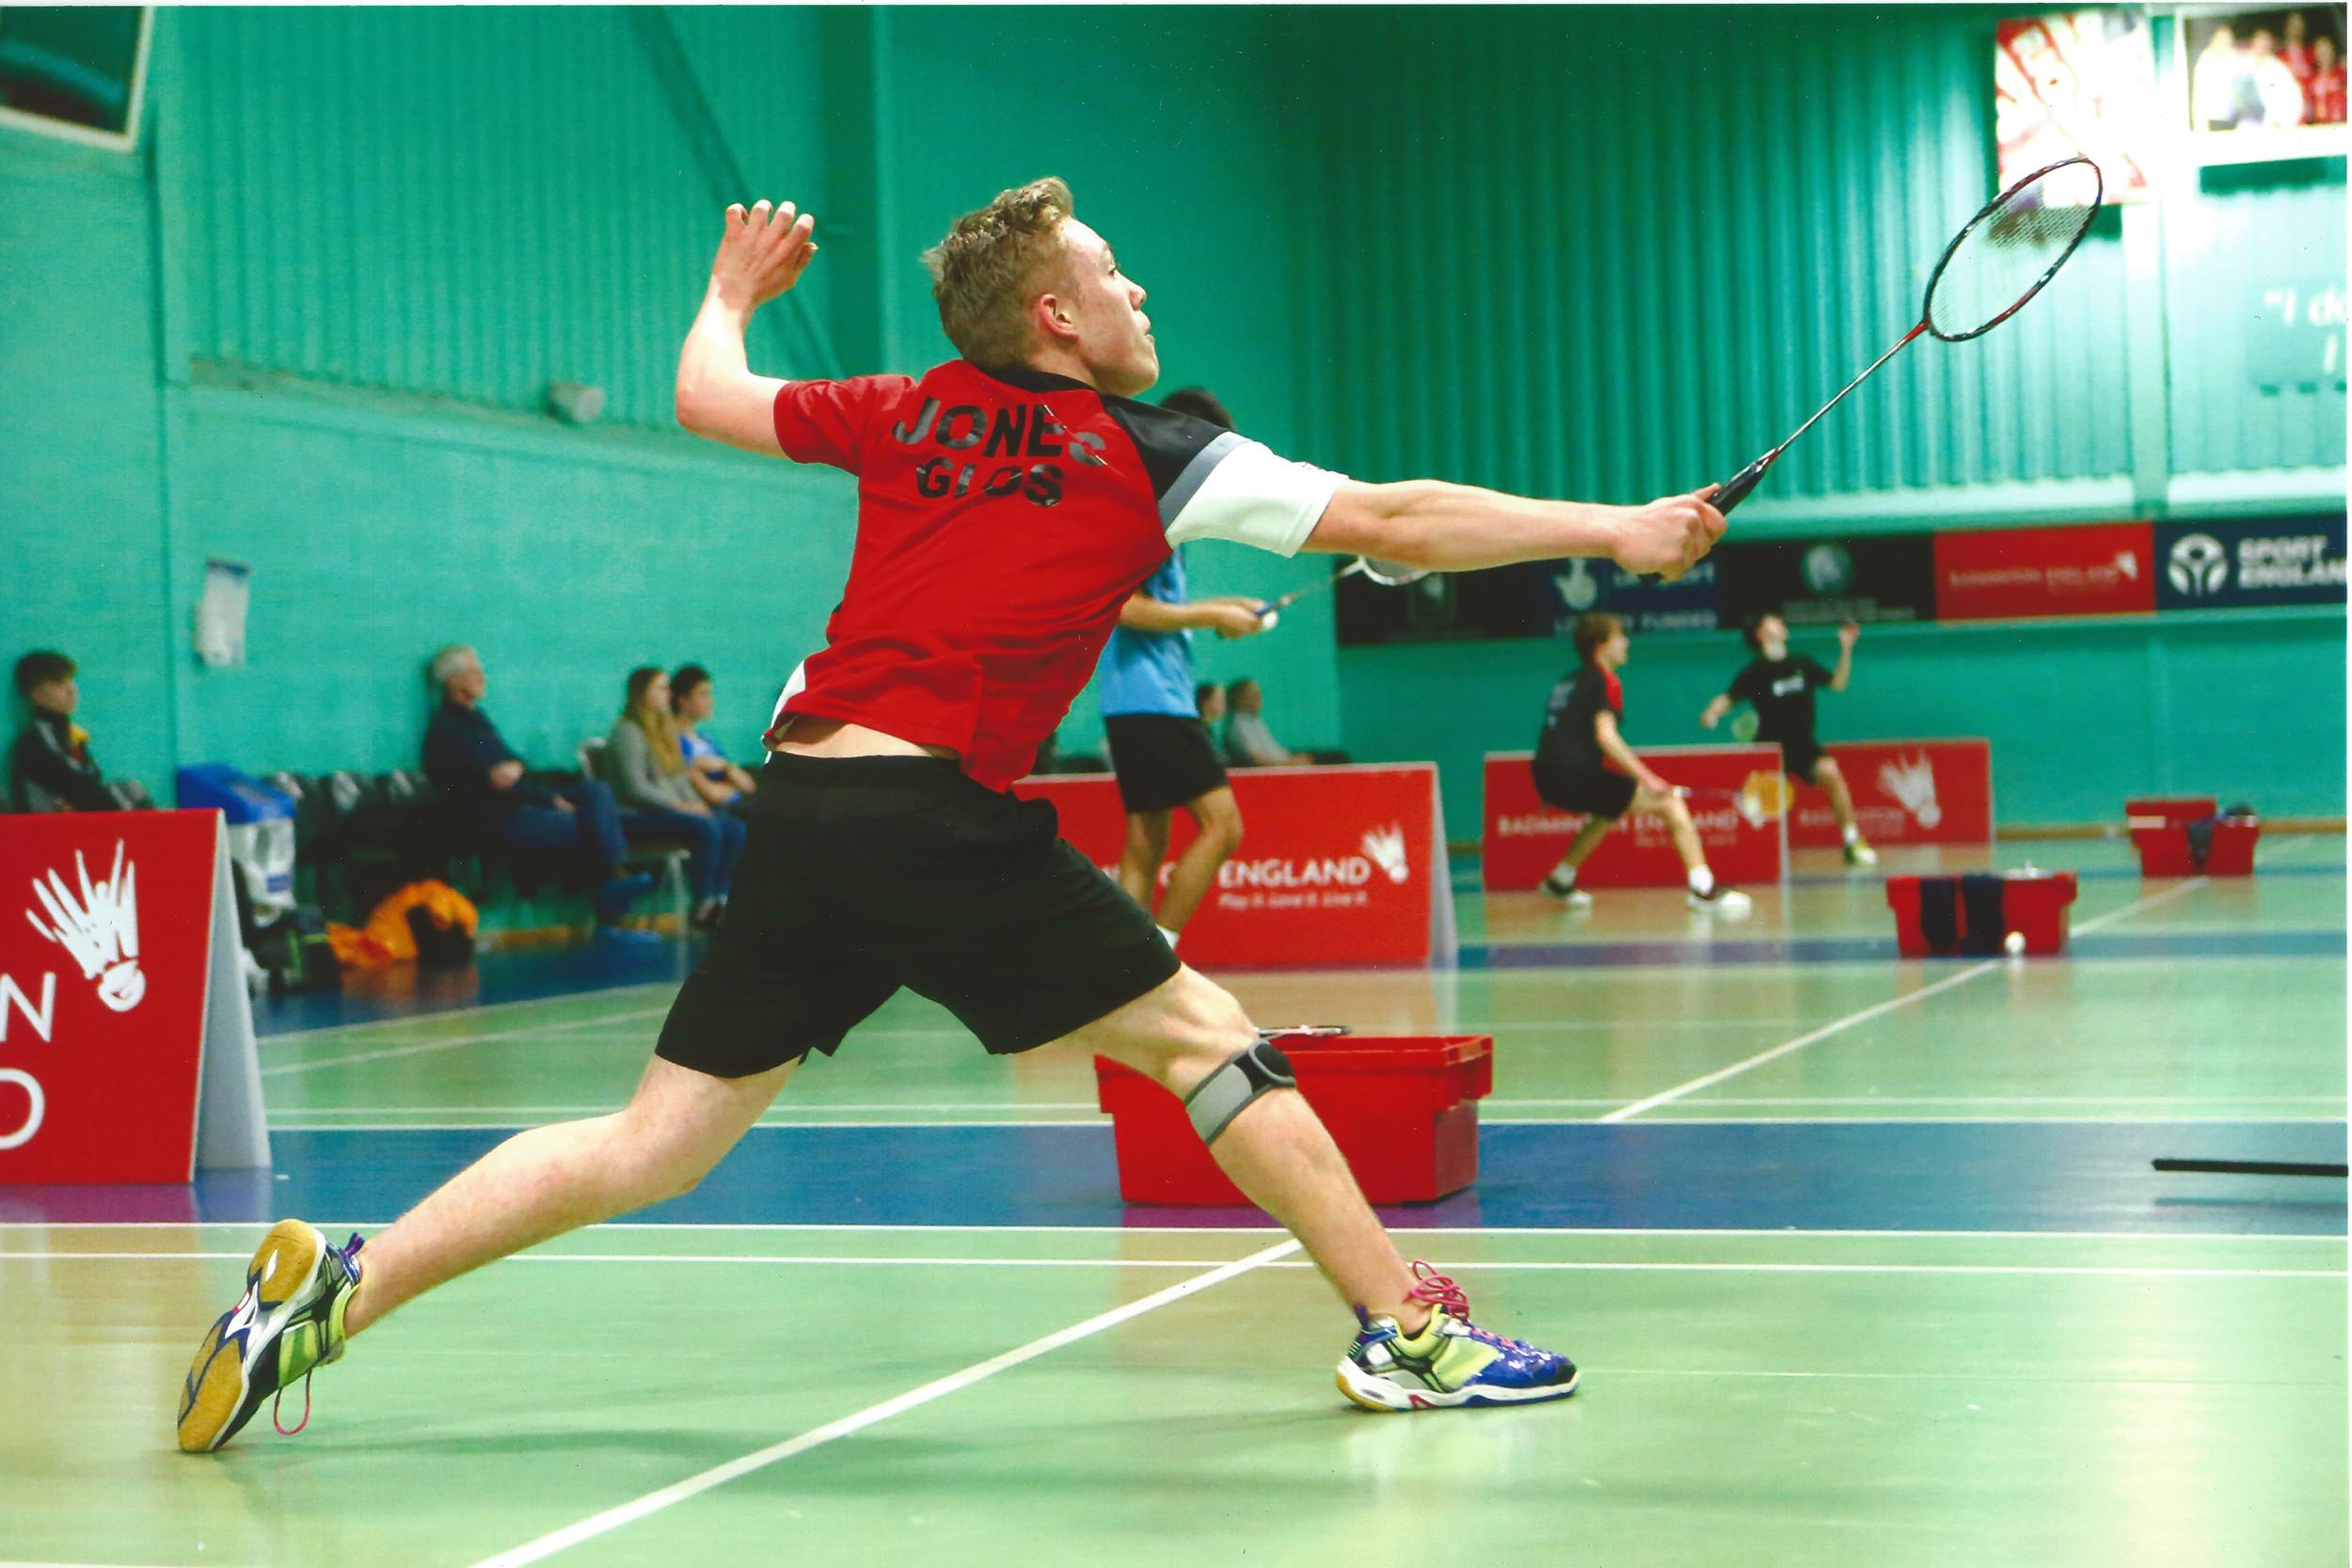 Henry_Badminton_Nationals_2016_LOWW.jpg